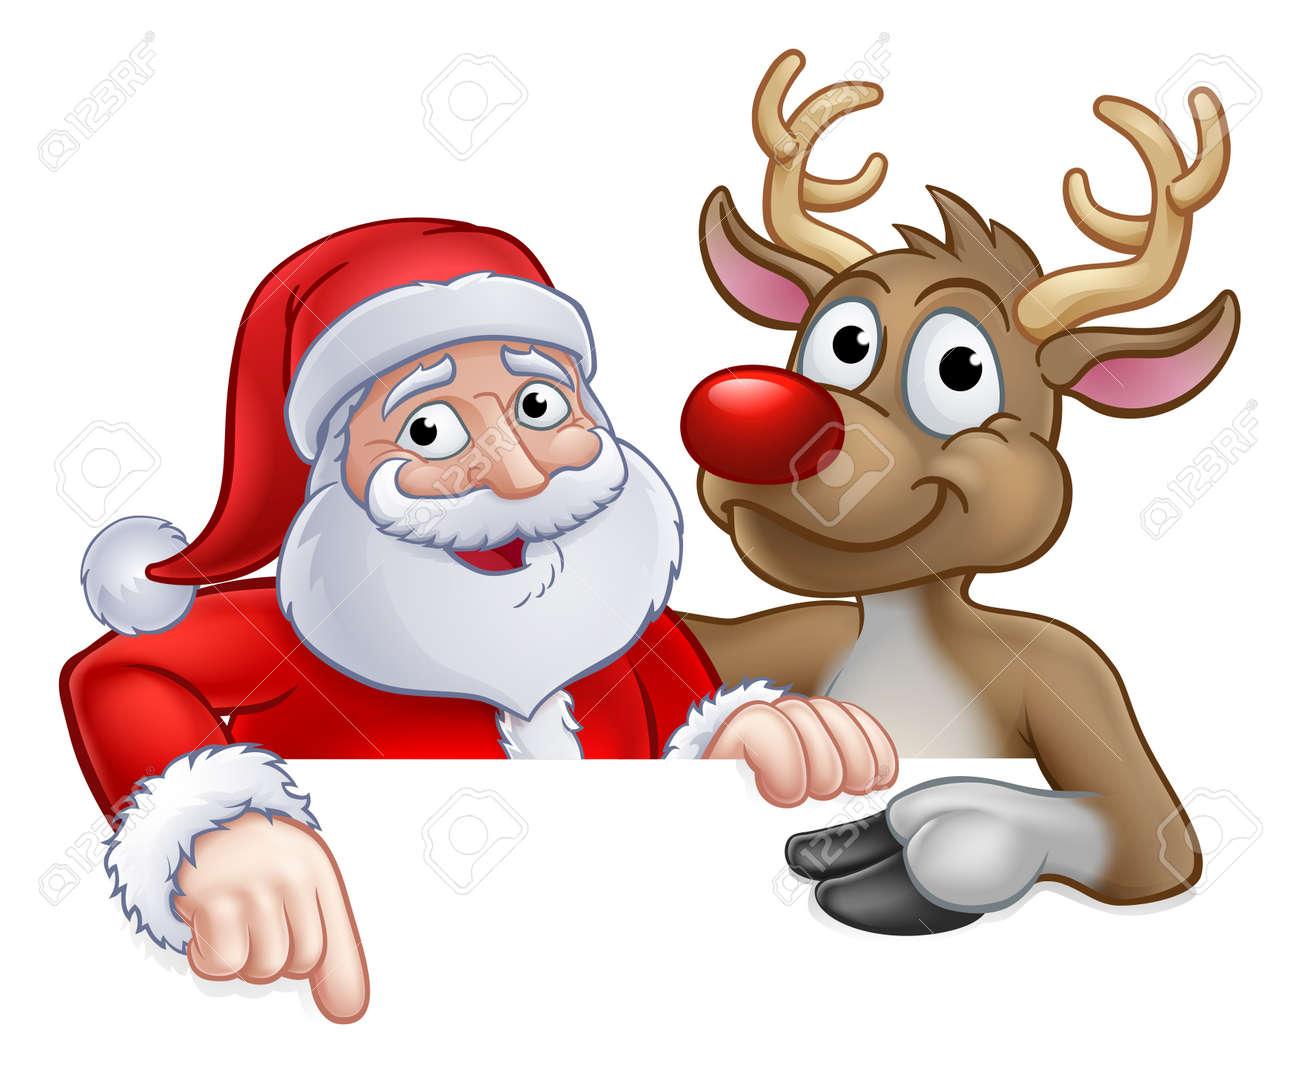 Christmas Cartoon Images Clip Art.Santa Claus And Reindeer Christmas Cartoon Characters Peeking